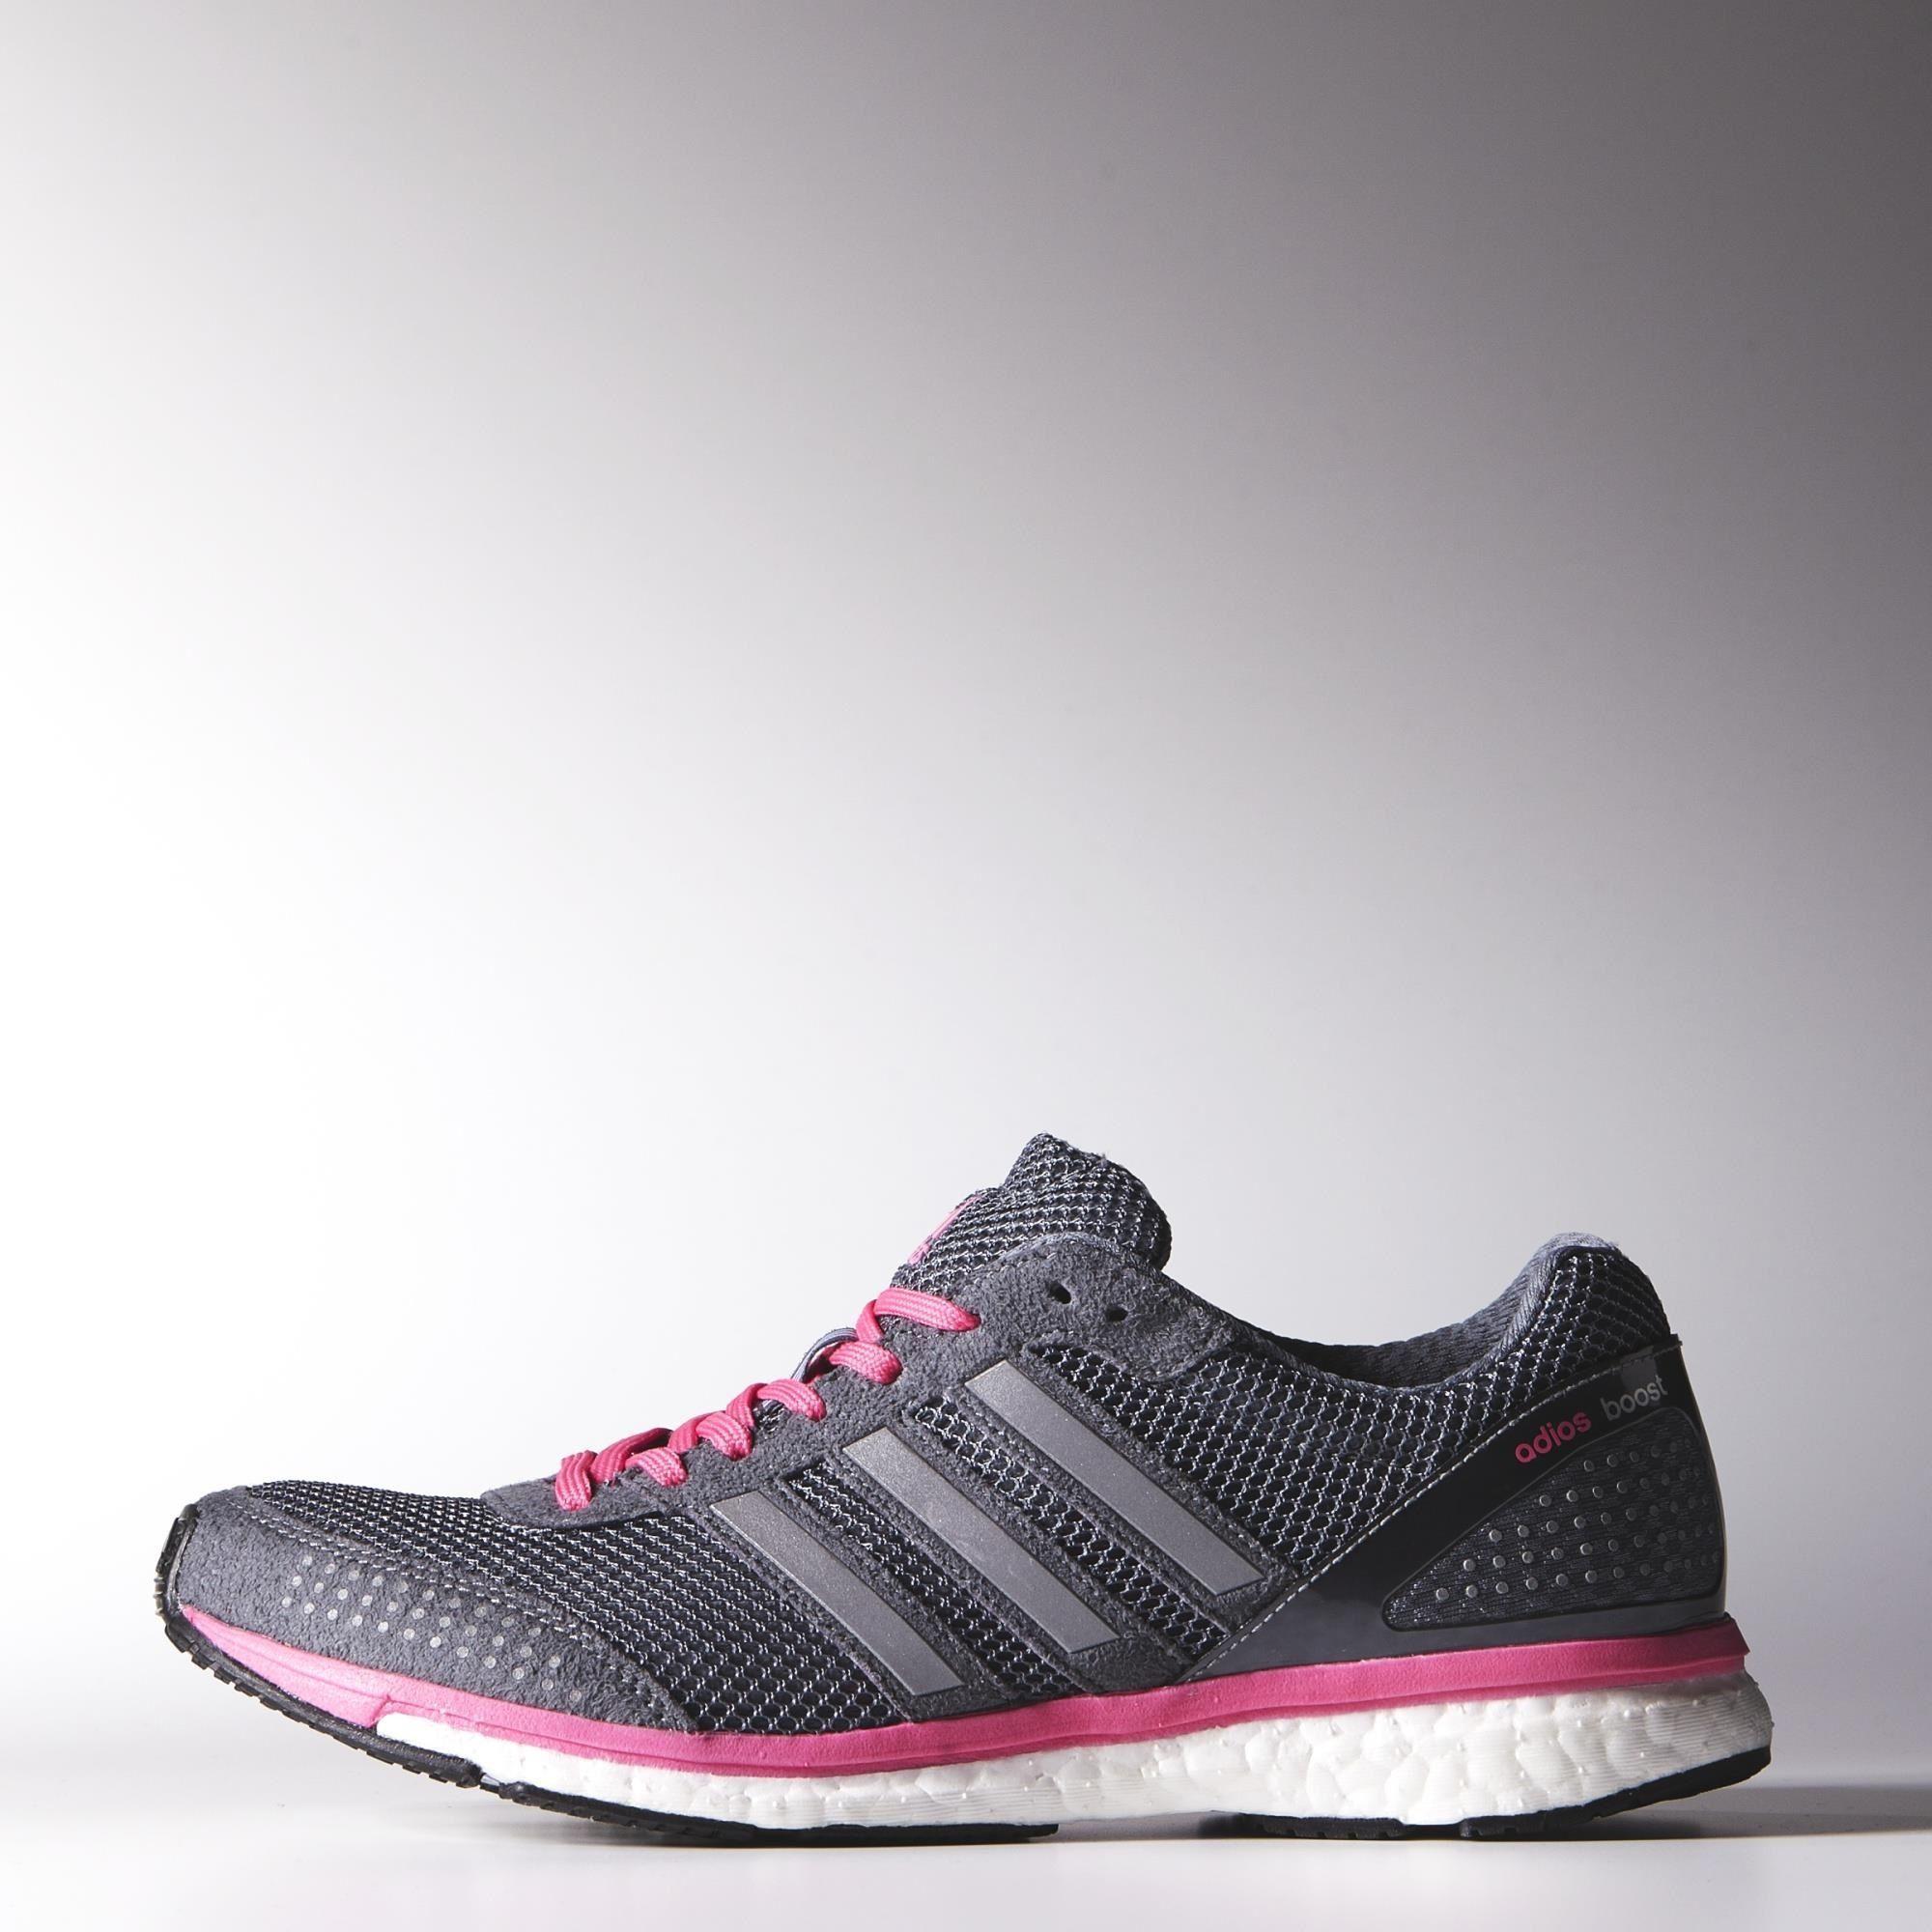 Adidas adizero adios impulso scarpe moda pinterest impulso